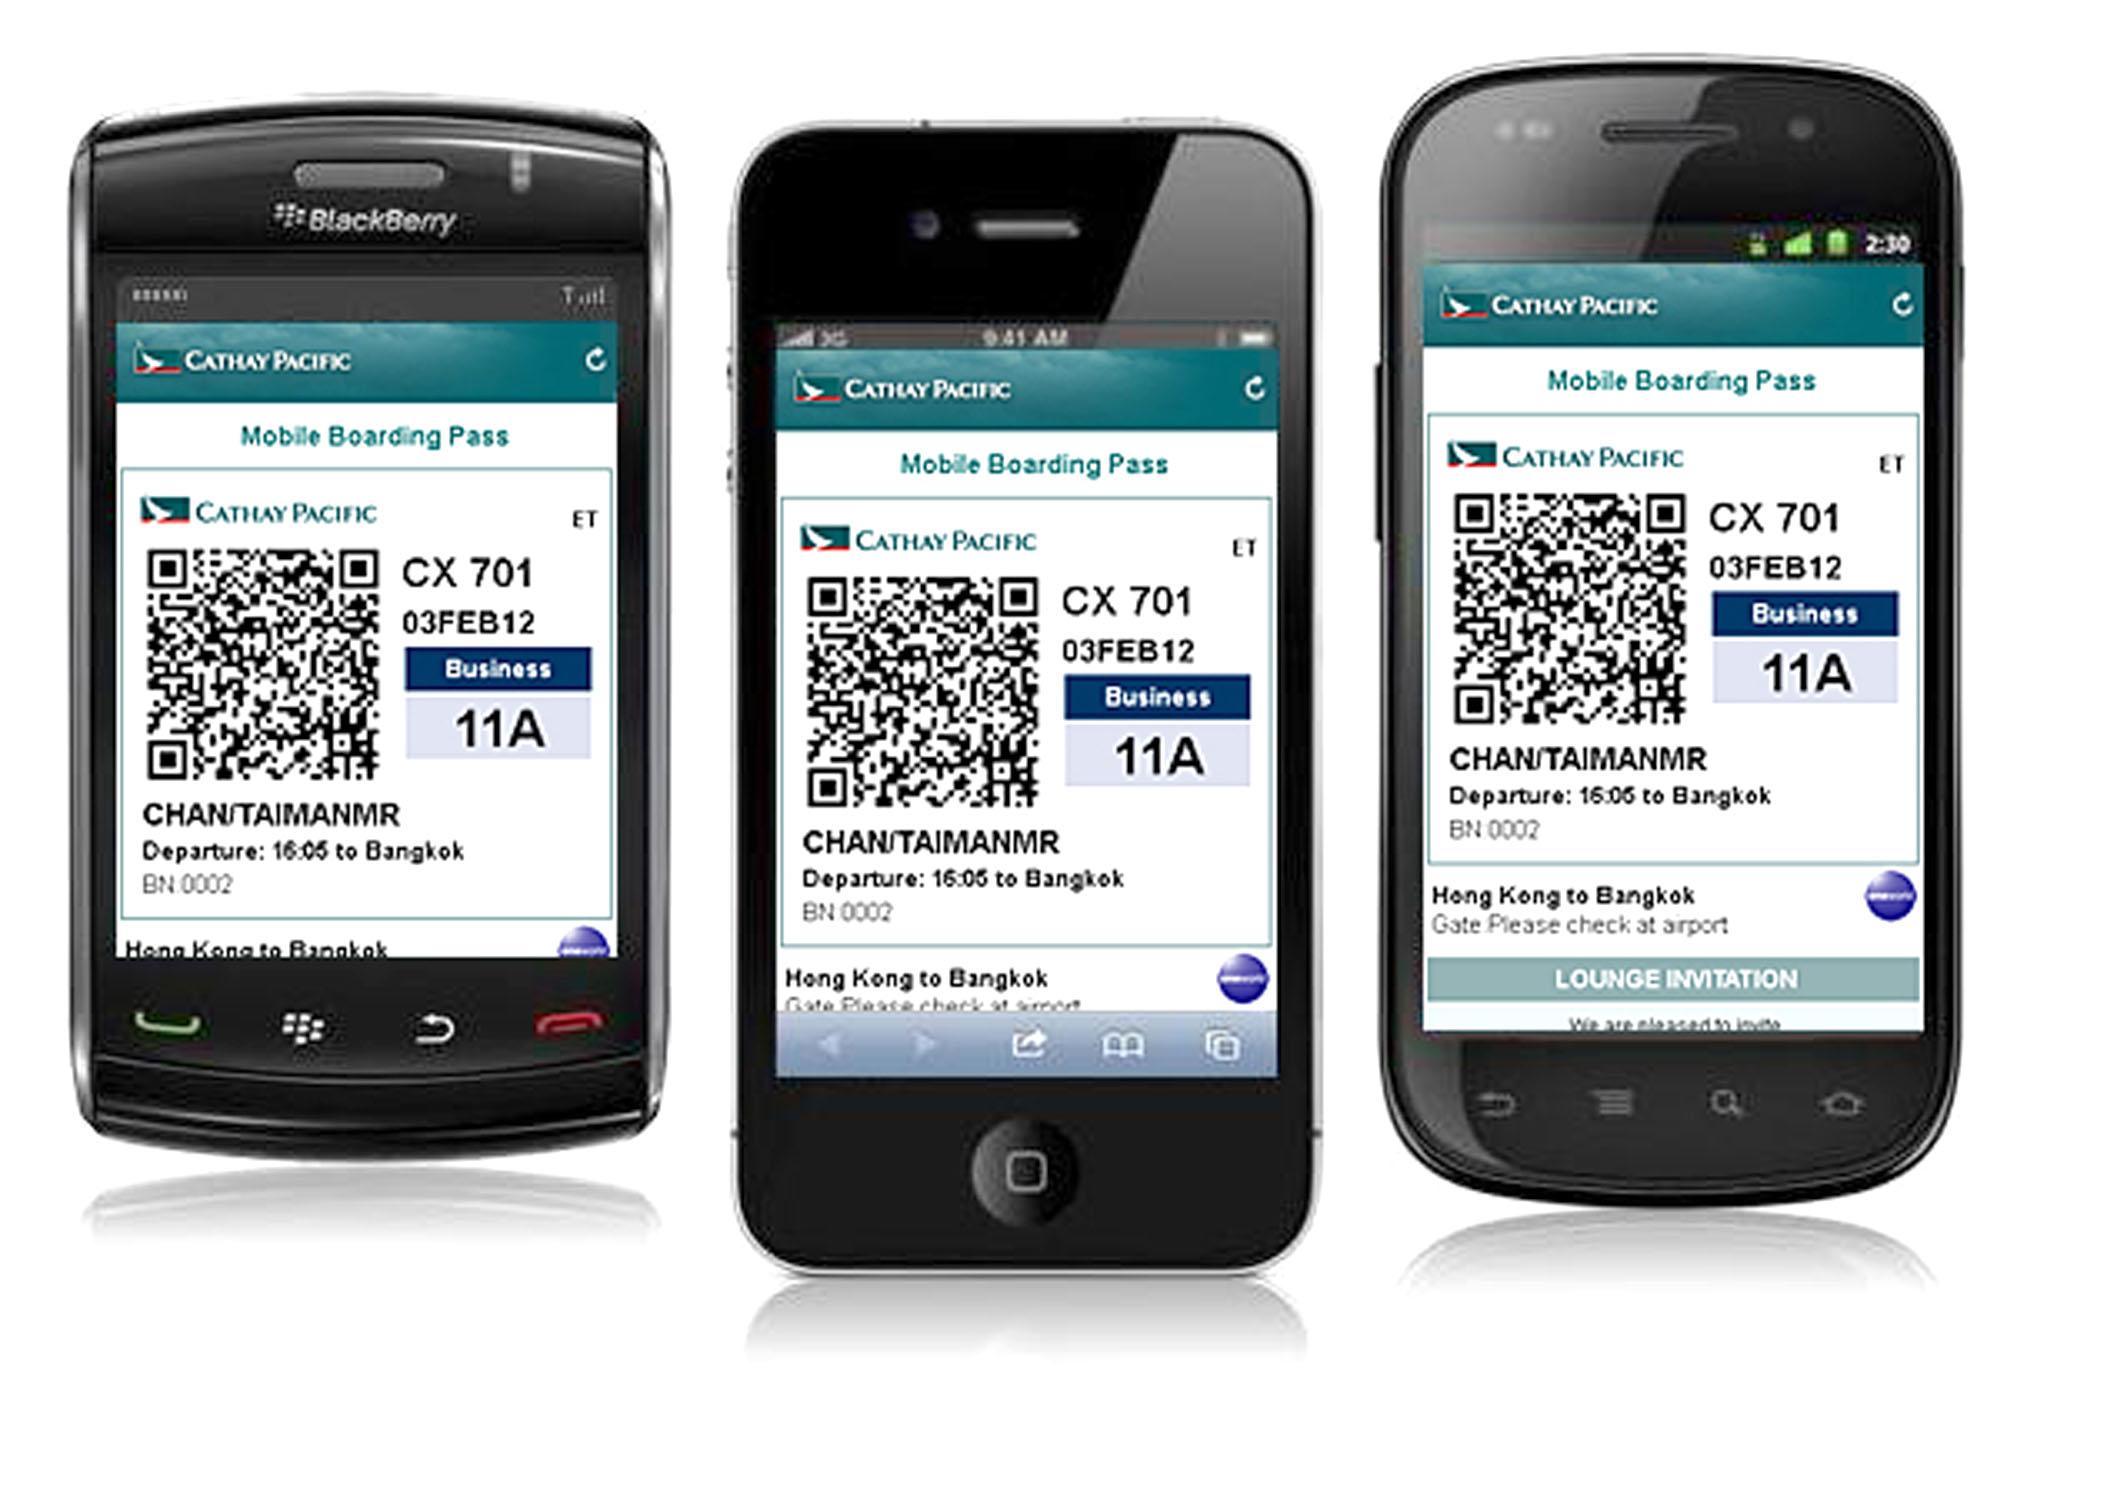 「Do」一下即登機:機場推手機登機證服務 - 香港 unwire.hk